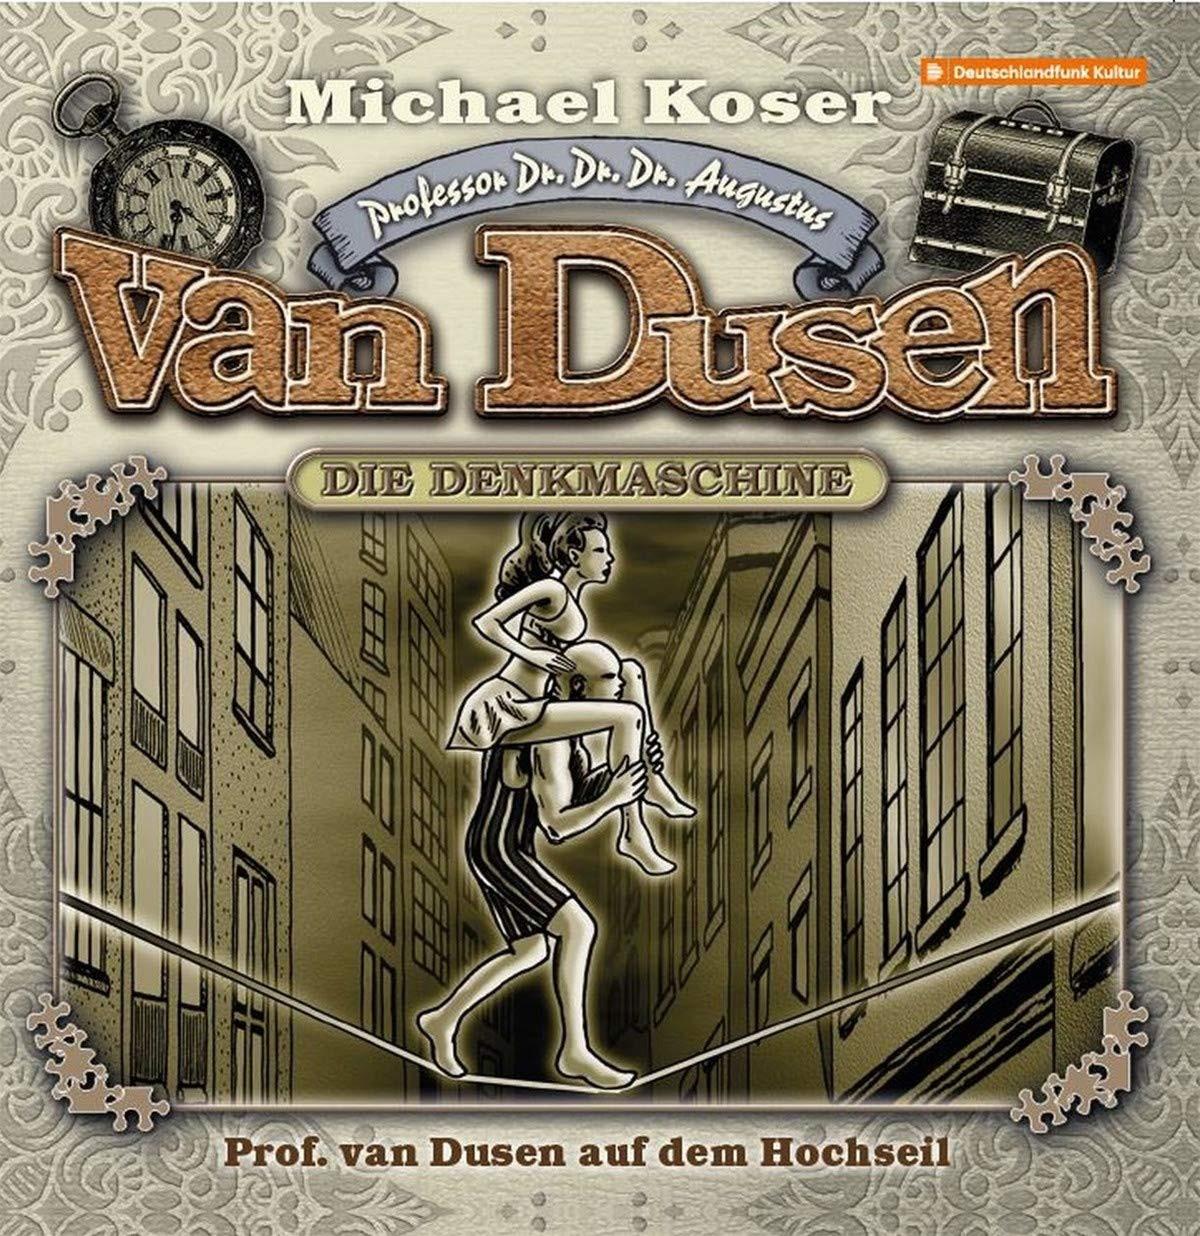 Professor van Dusen - Folge 28: Professor van Dusen auf dem Hochseil